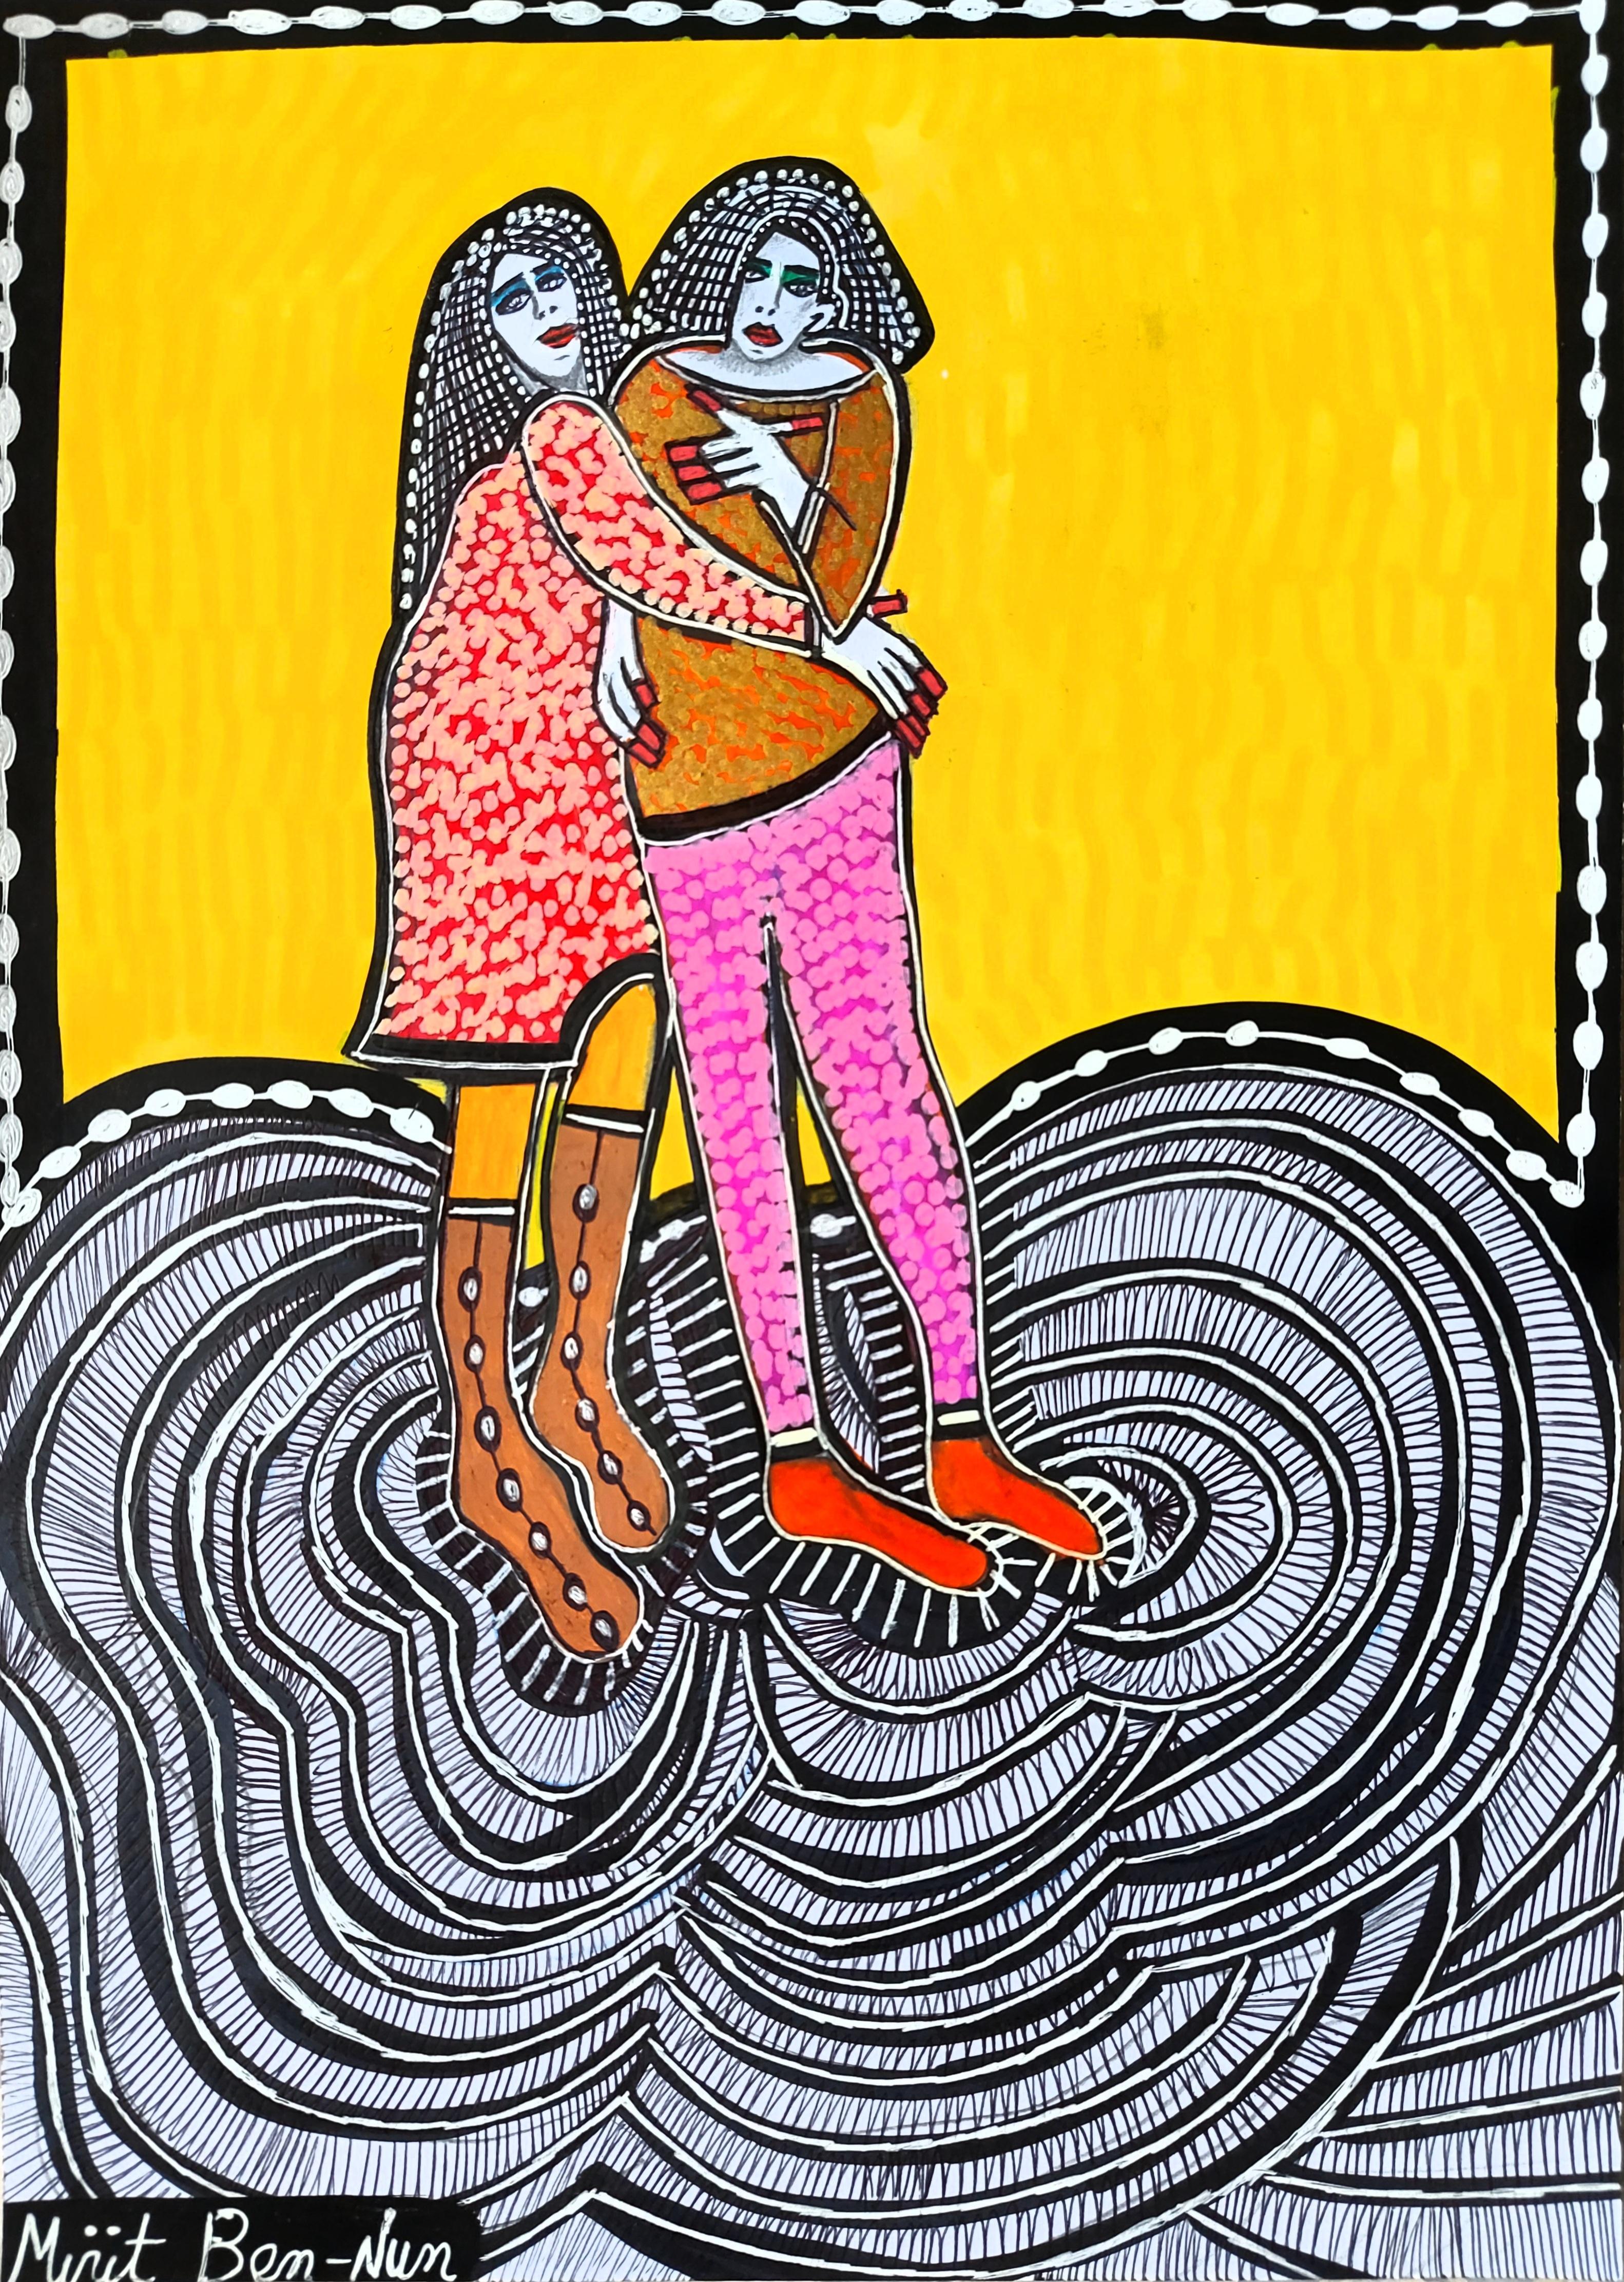 Best art from Israel by Mirit Ben-Nun by Deborah Shallman - Illustrated by Mirit Ben-Nun - Ourboox.com